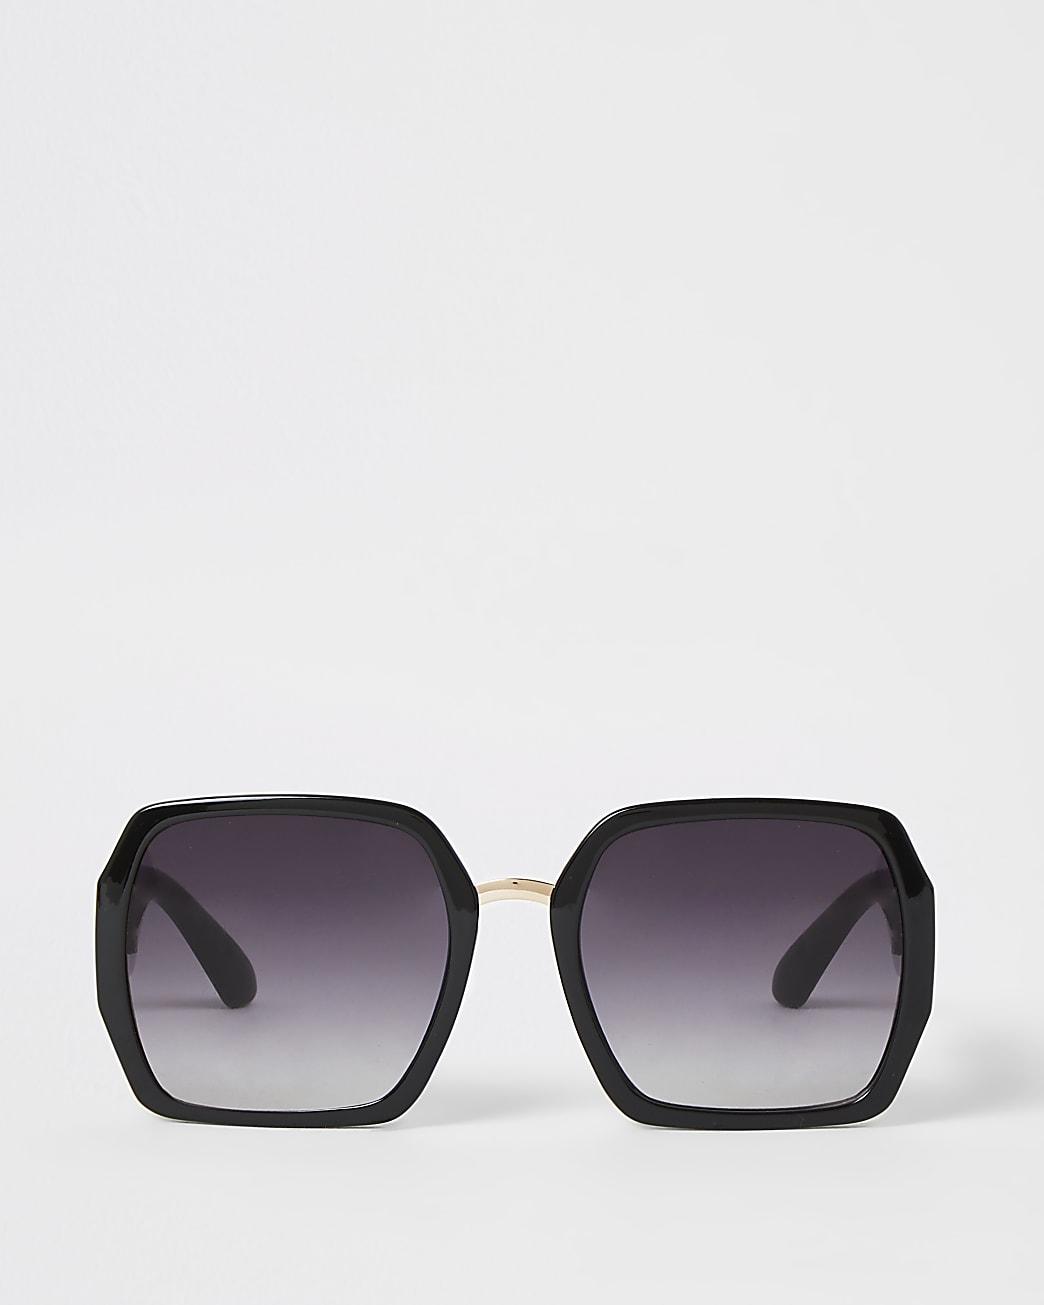 Black square shape glam sunglasses